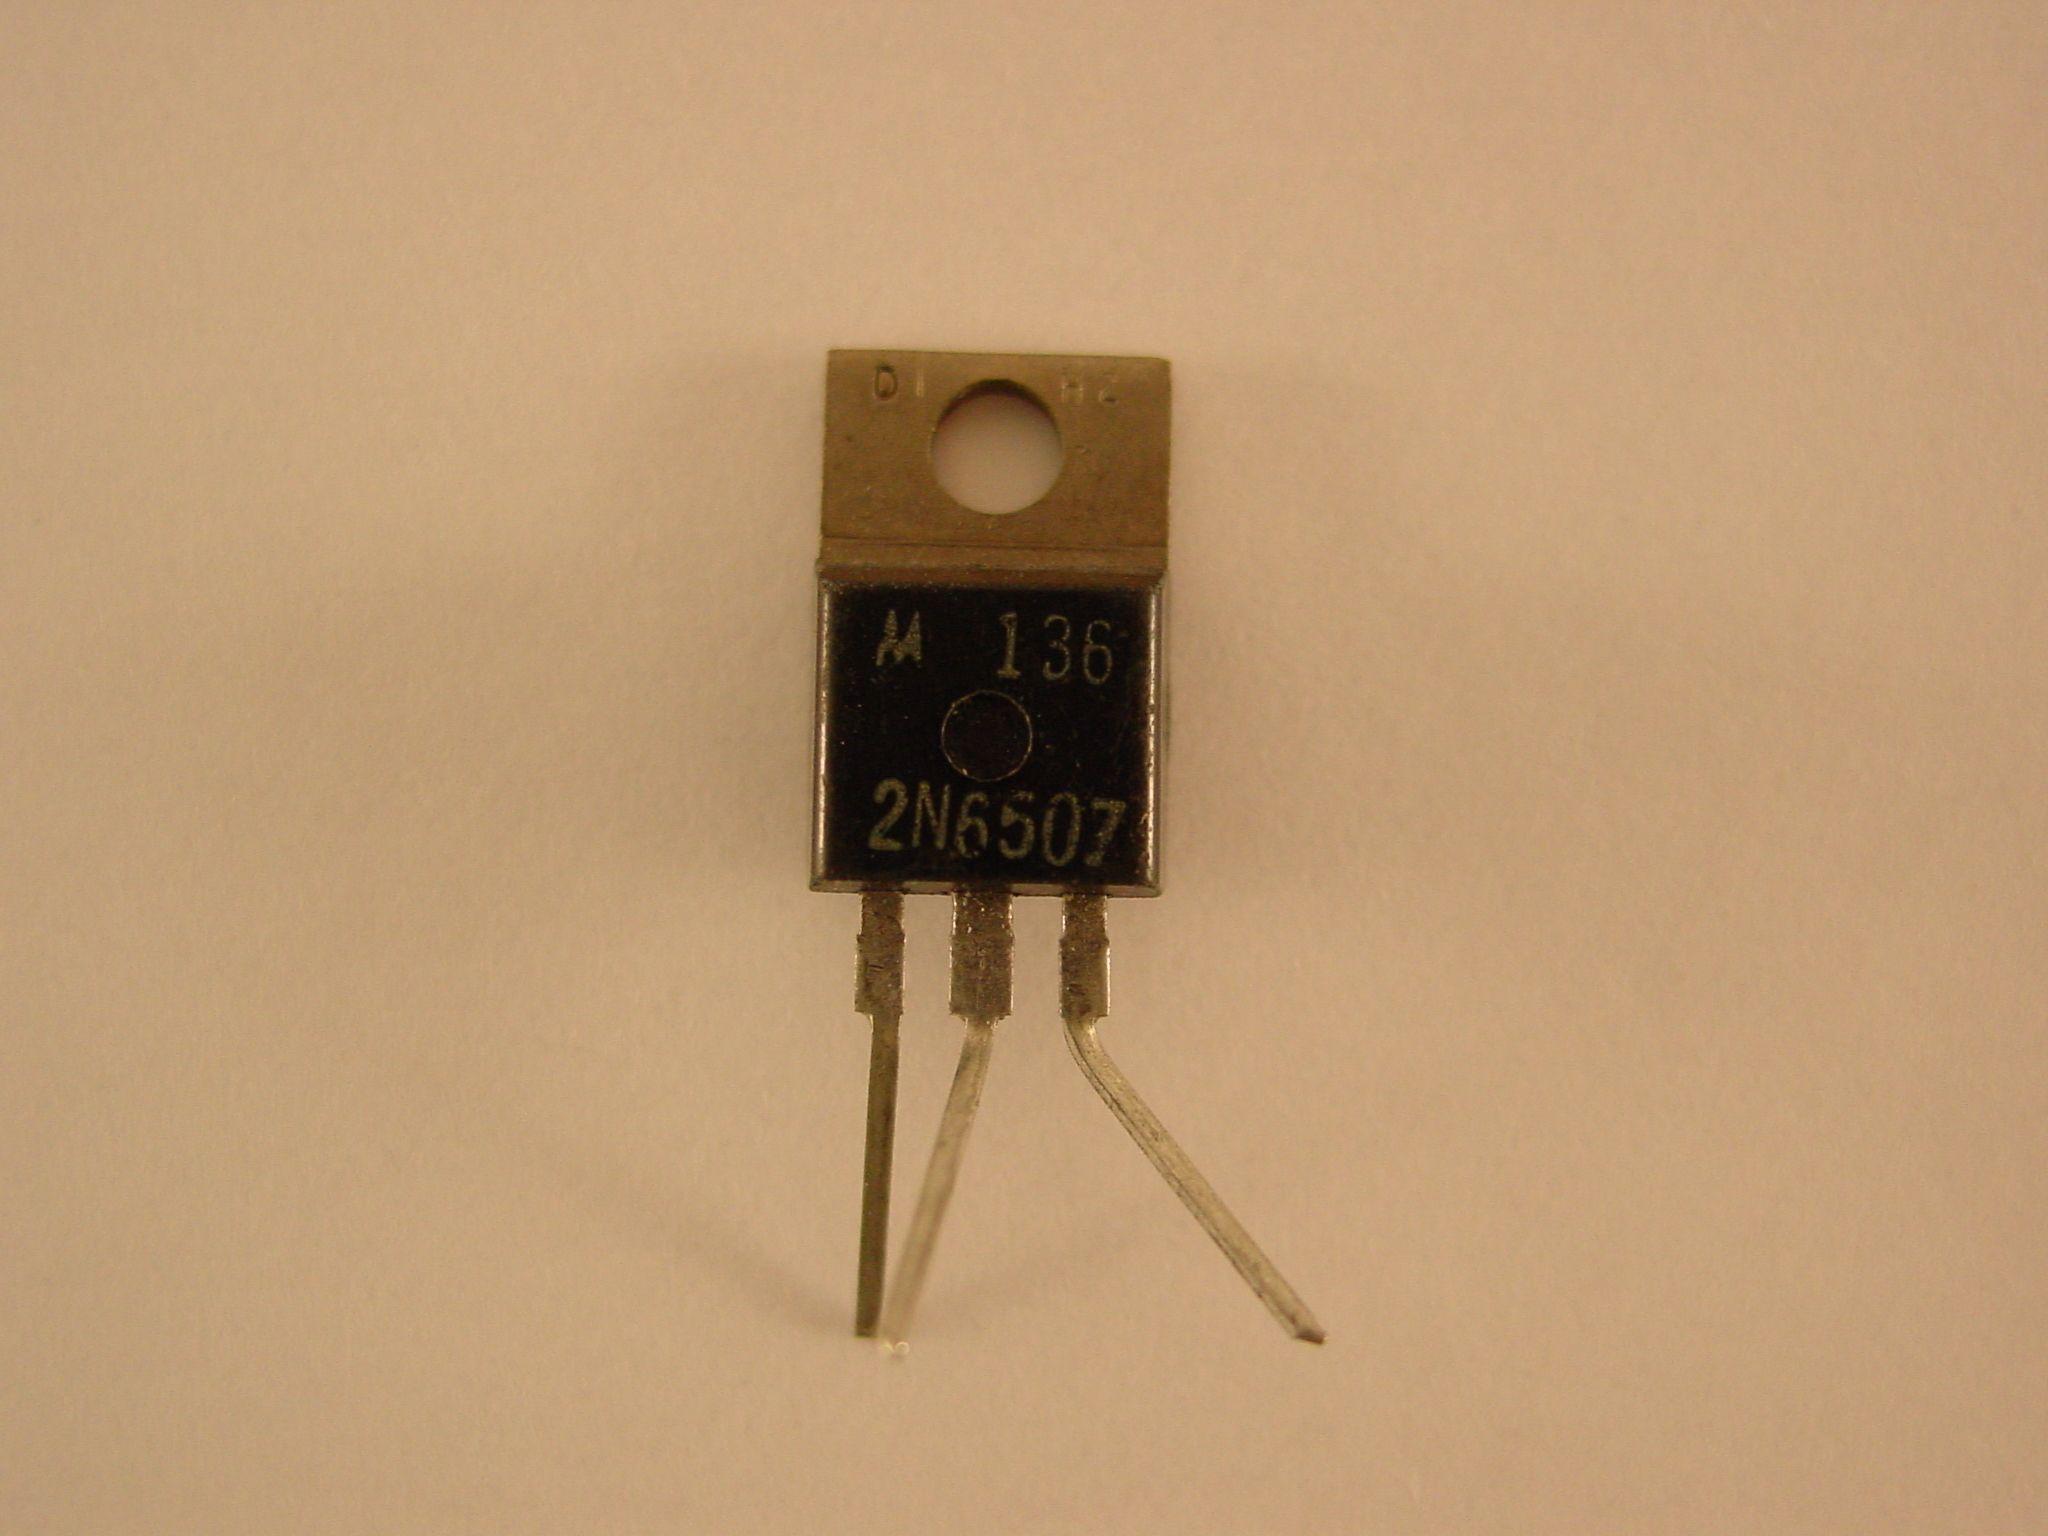 [Transistor bipolar]. [19--]. 3 x 1 x 0,5 cm. Museo Histórico de la Informática (Boadilla del Monte, Madrid) http://www.mhi.fi.upm.es Colección Digital Politécnica http://cdp.upm.es/R/?object_id=476914&func=dbin-jump-full